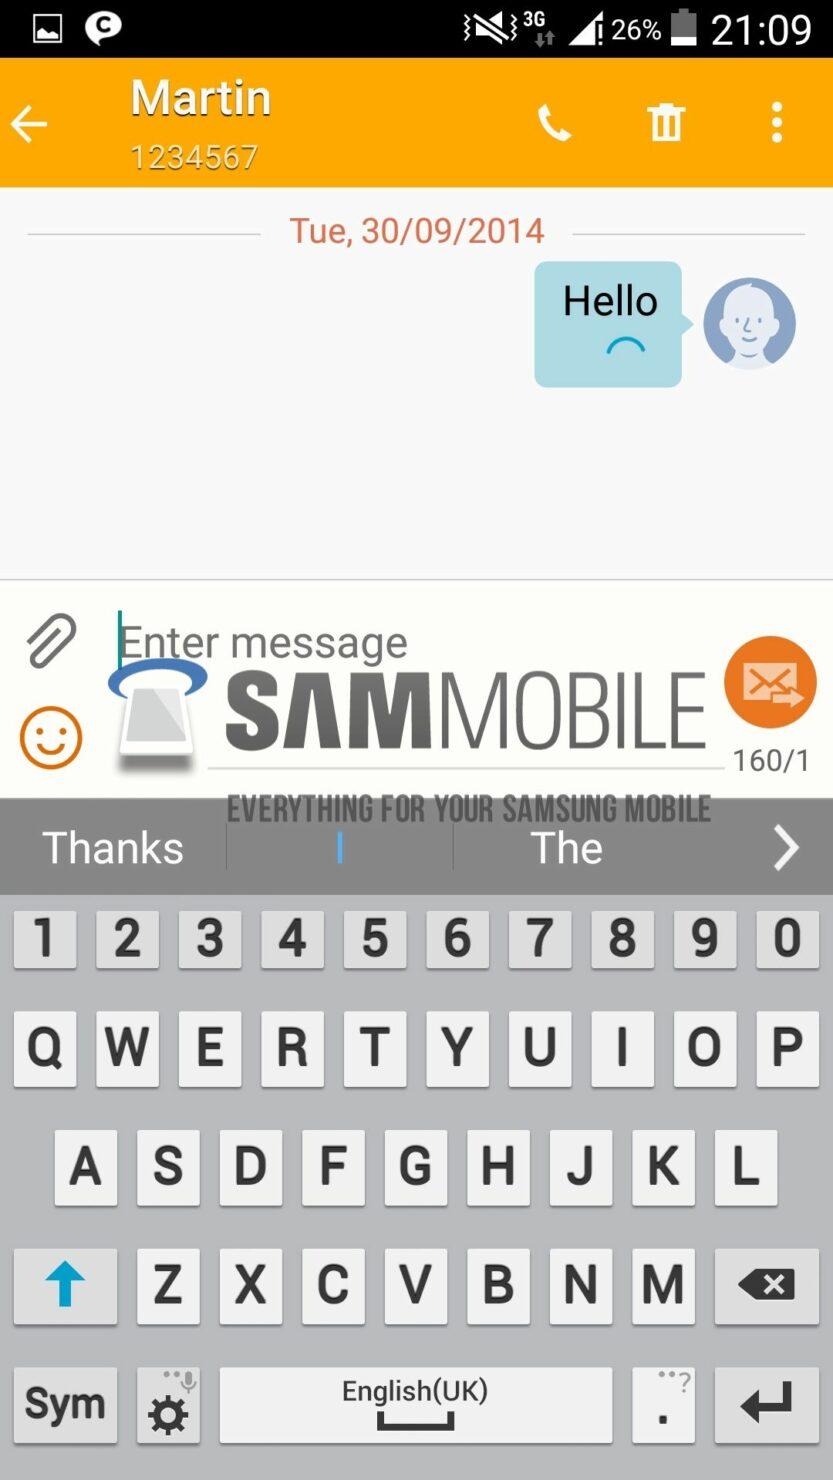 samsung-galaxy-s5-running-android-lollipop-7